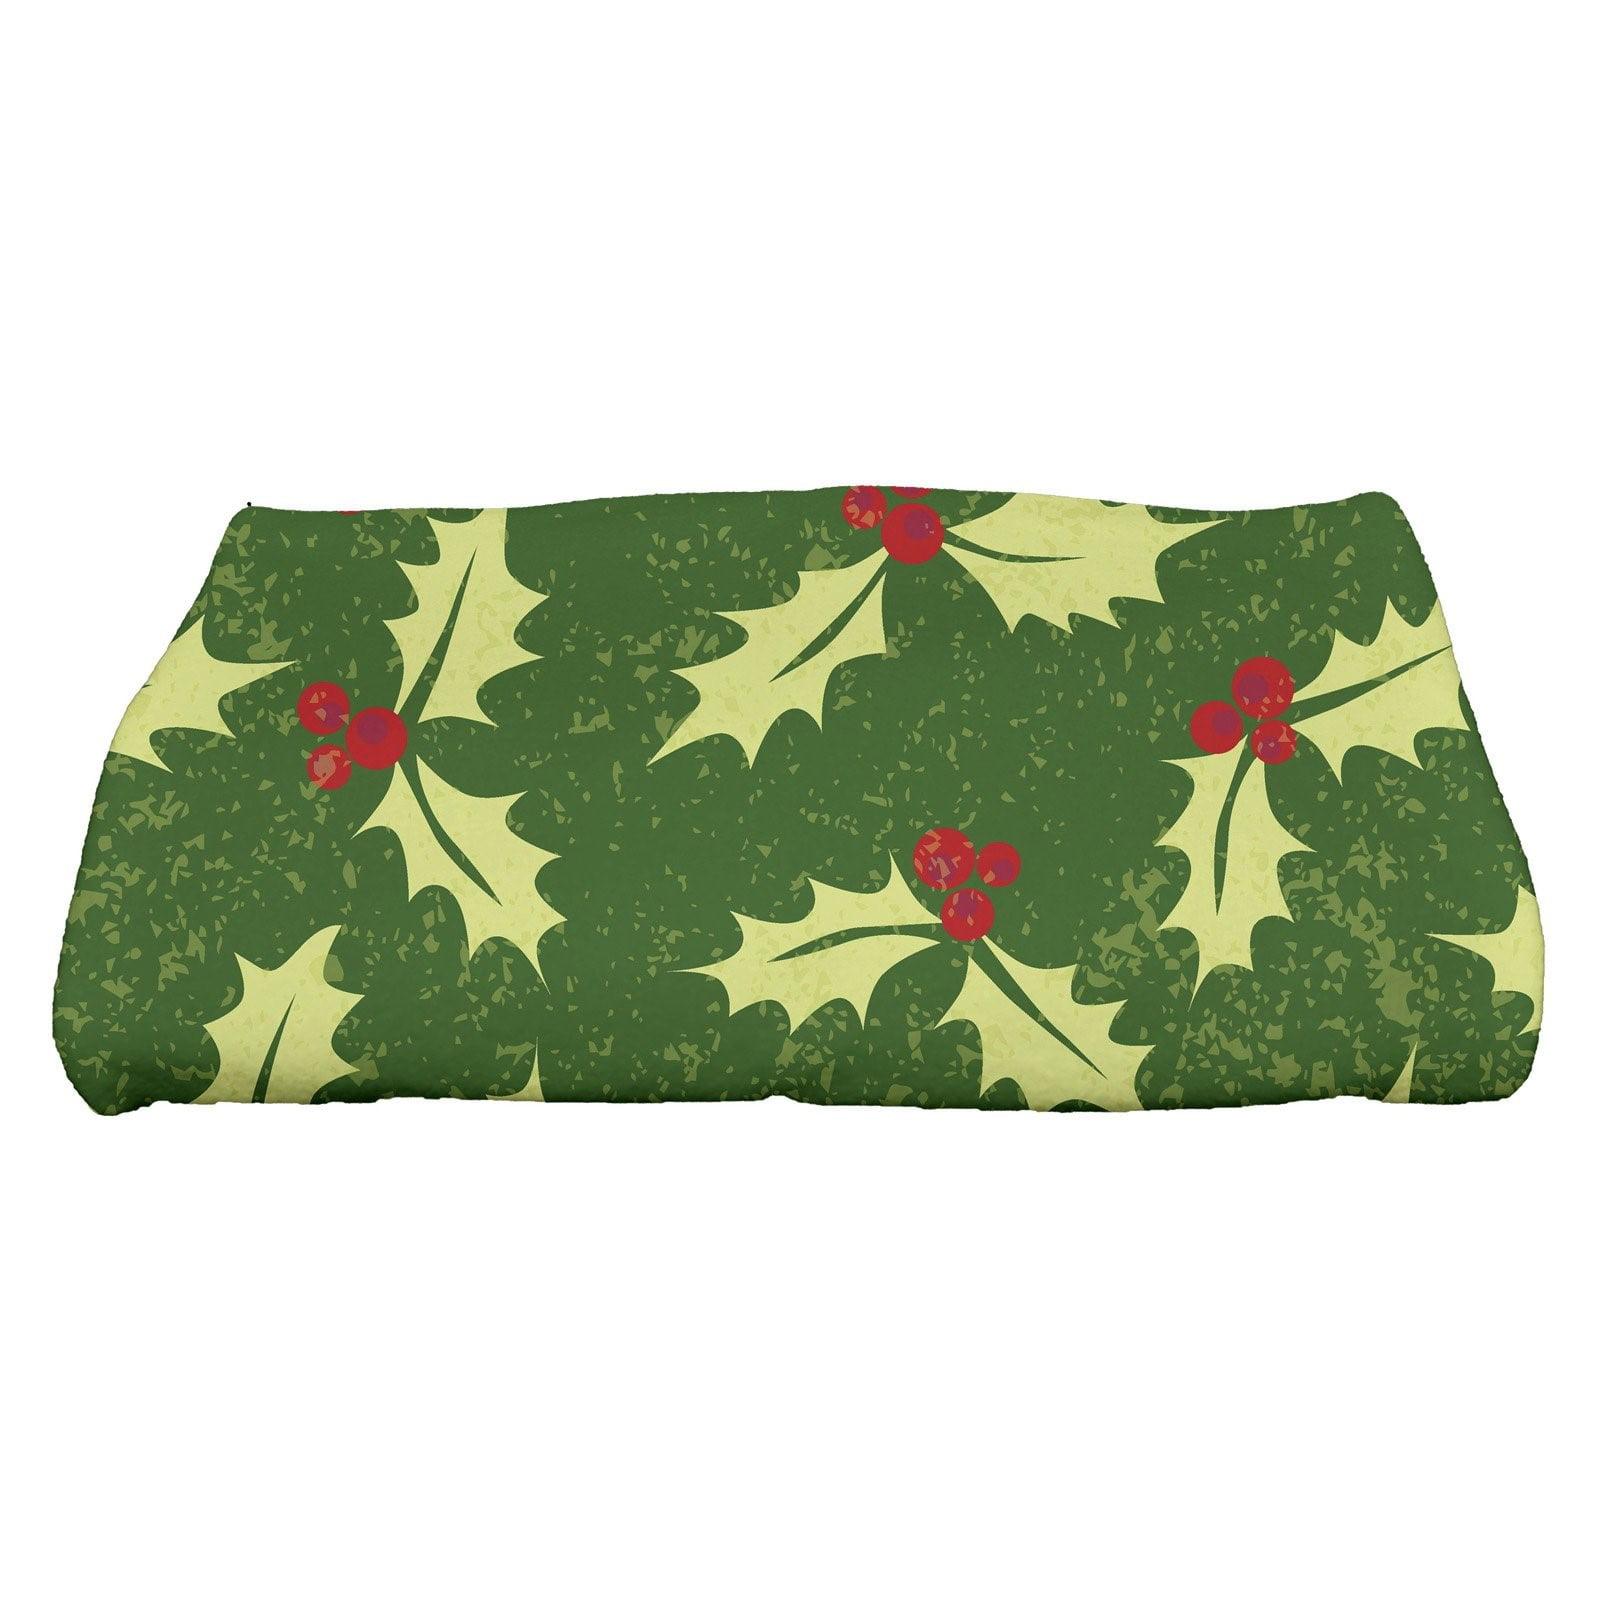 E by design Allover Holly Decorative Holiday Floral Print Bath Towel 28 x 58 Green THFN697GR7GR21